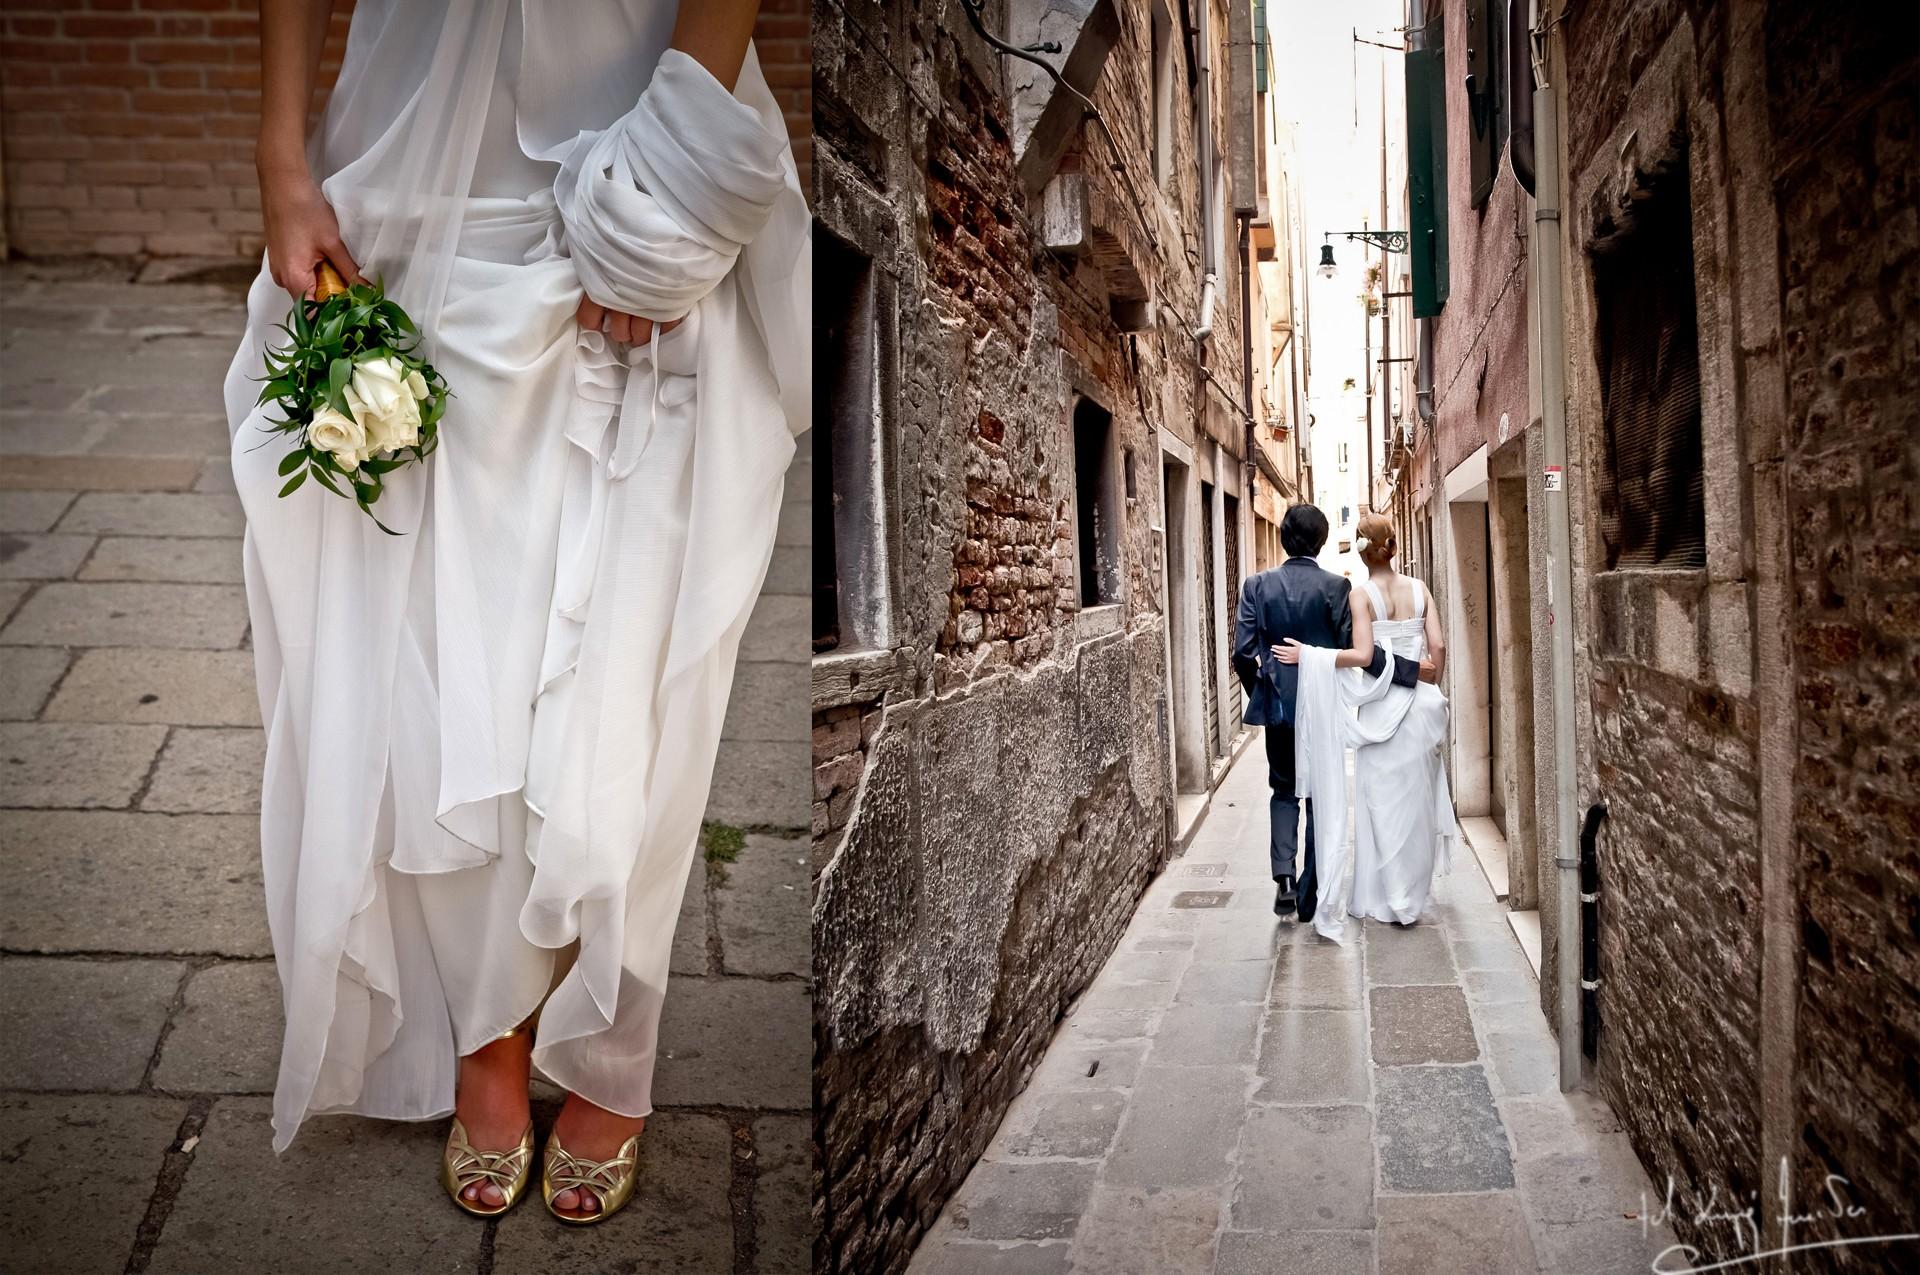 Ślub w wenecji 76 Manuela Luiza & Young Seon Song